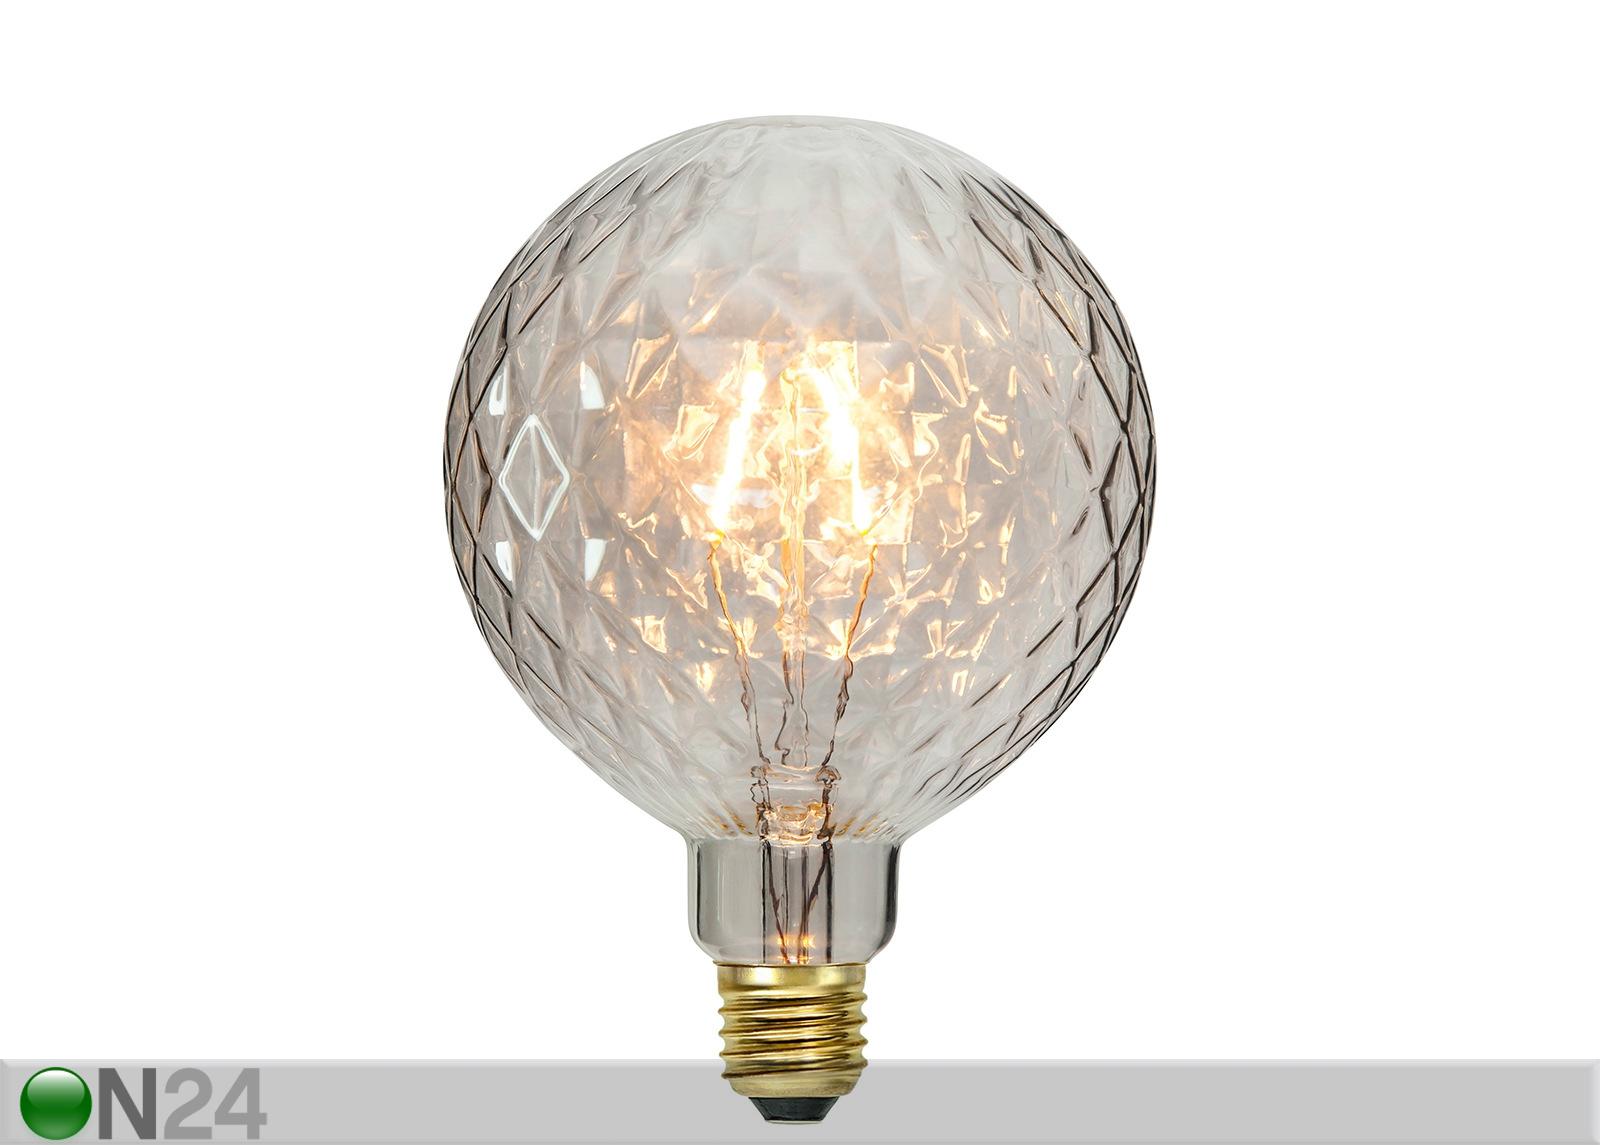 81d49e45a81 Dekoratiivne LED pirn E27 2,2 W AA-142494 - ON24 Sisustuskaubamaja